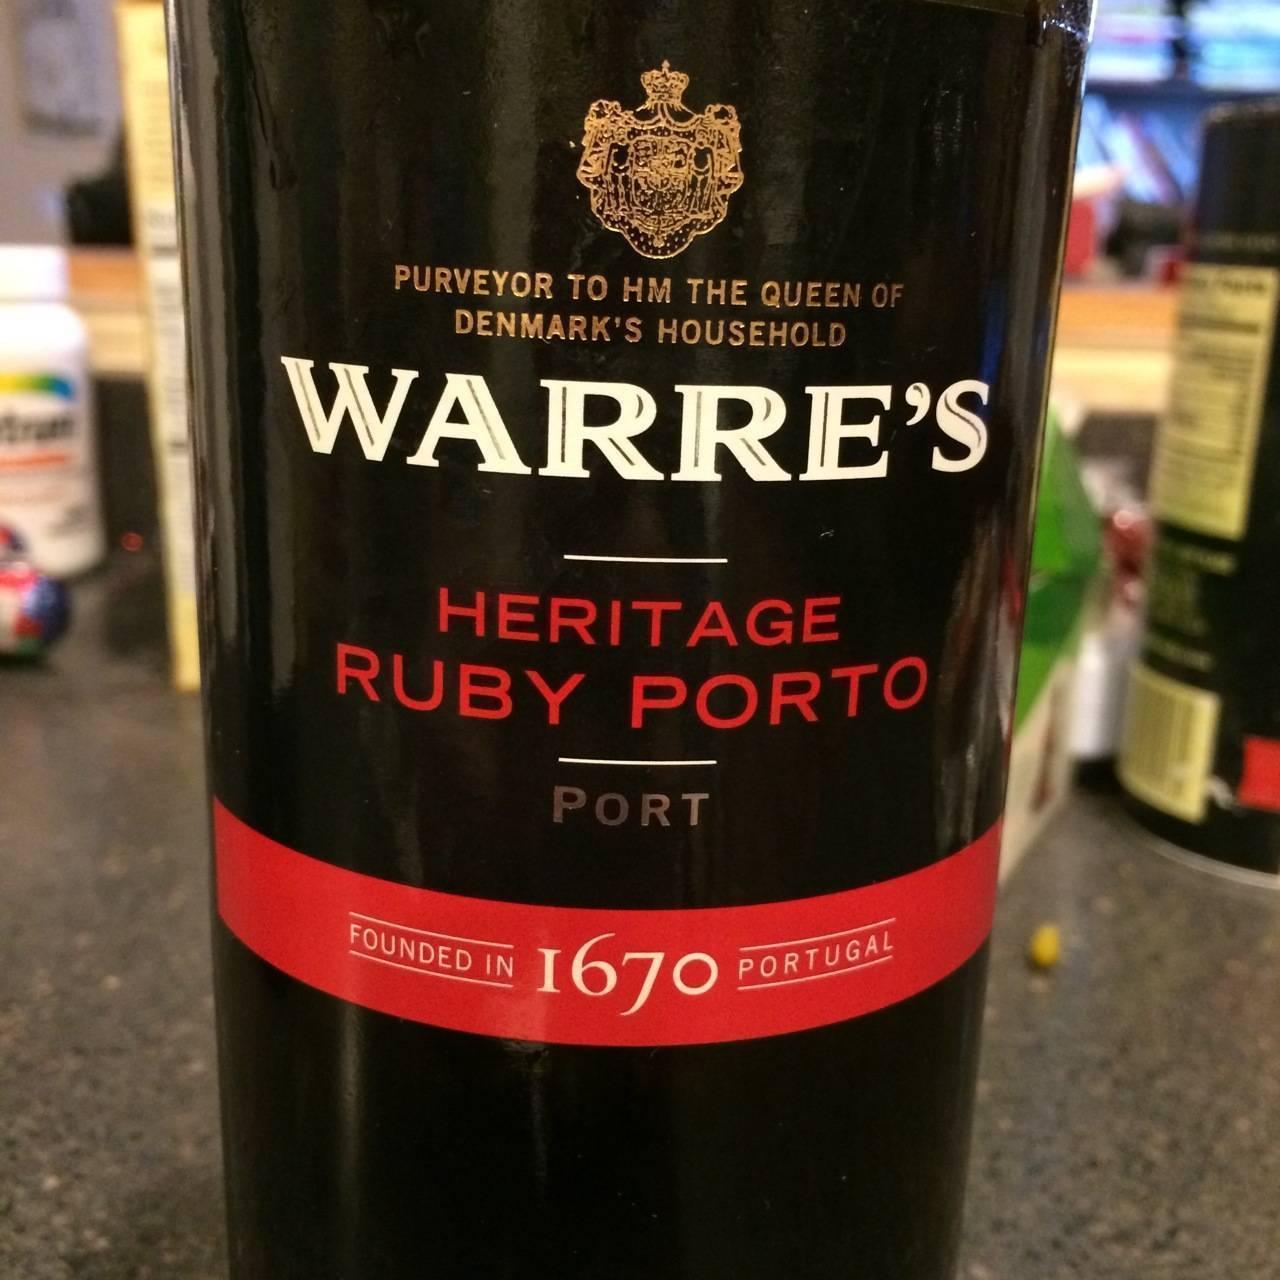 Обзор портвейна warres heritage ruby port